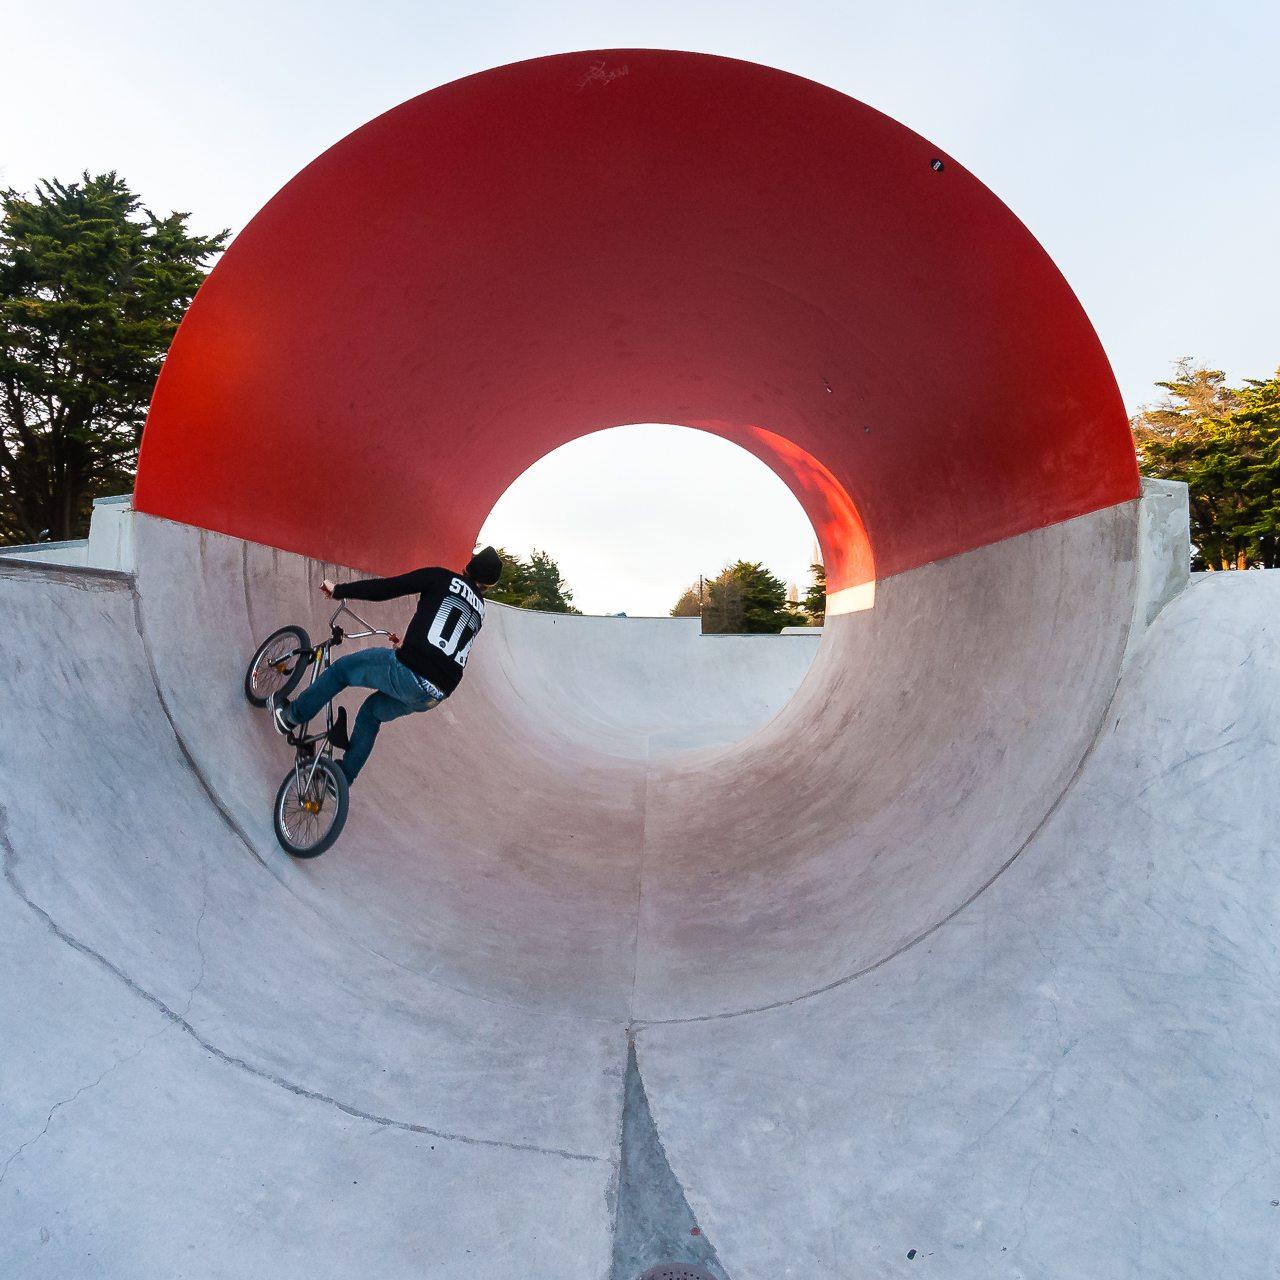 Matthieu Lumen / Photographe